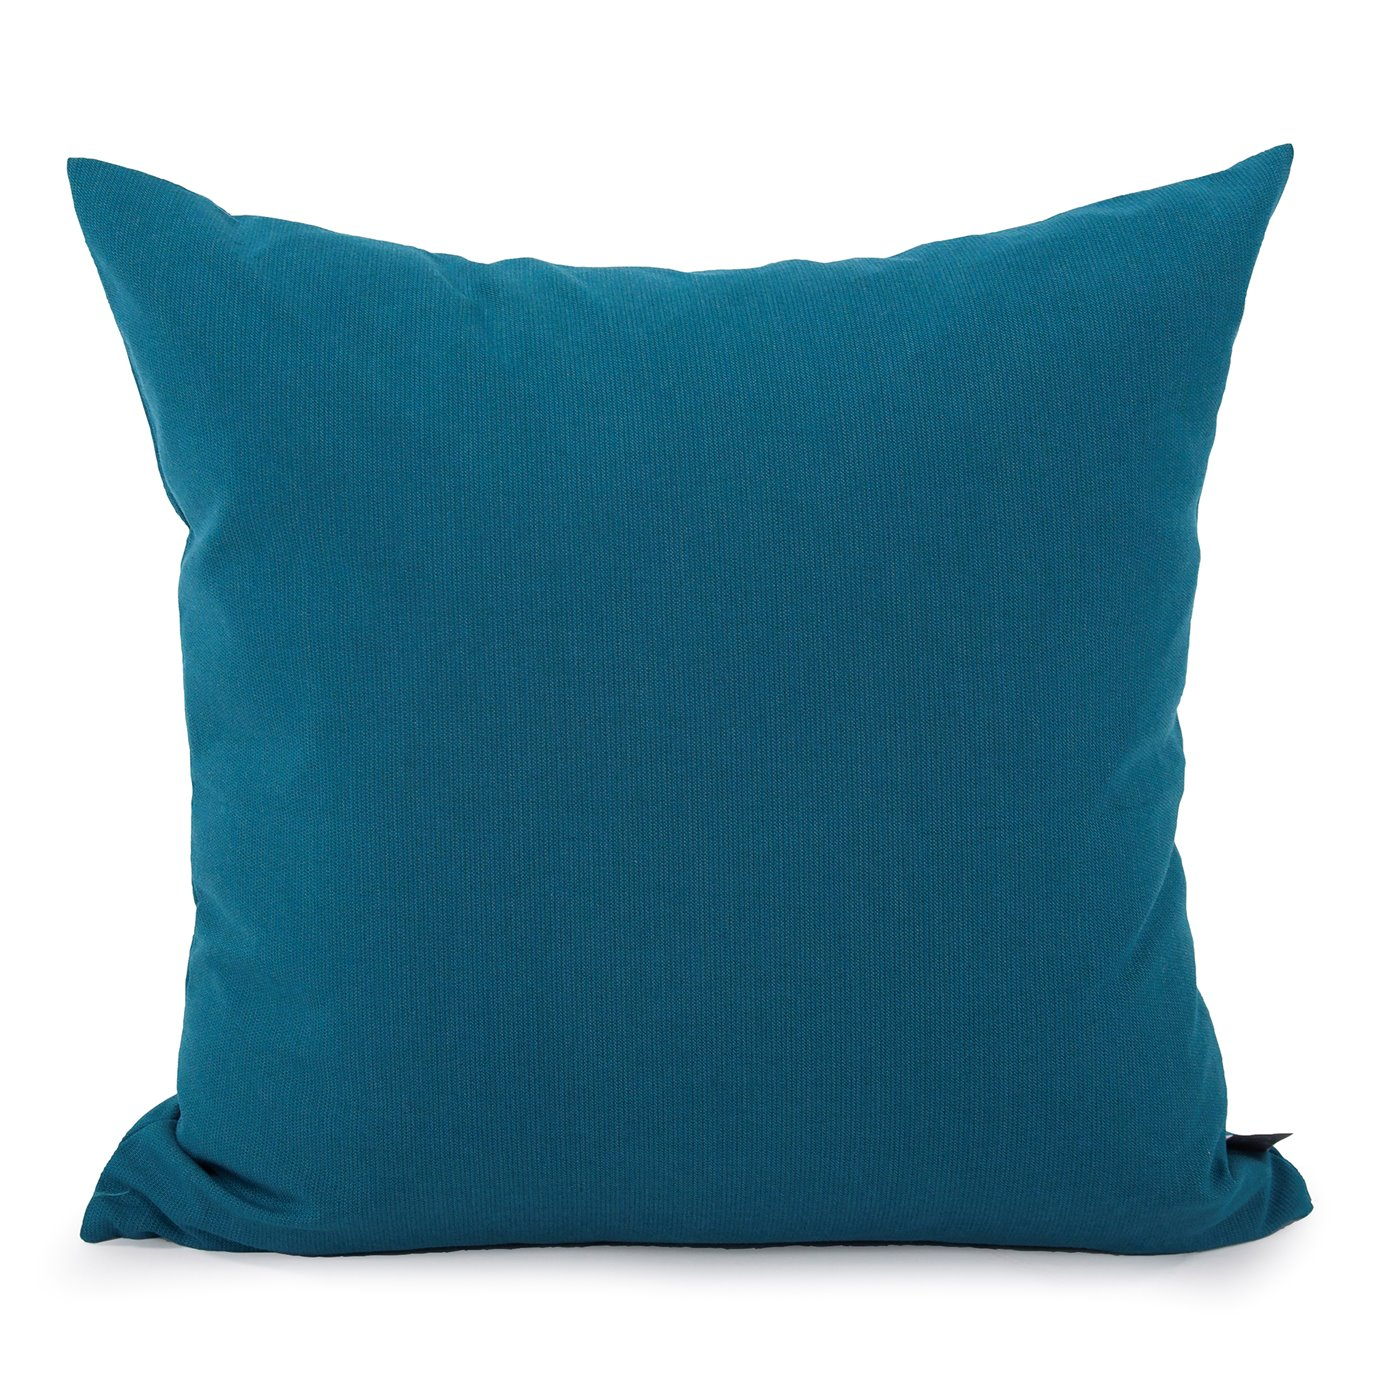 "Howard Elliott 20"" x 20"" Pillow Outdoor Sunbrella Seascape Turquoise"